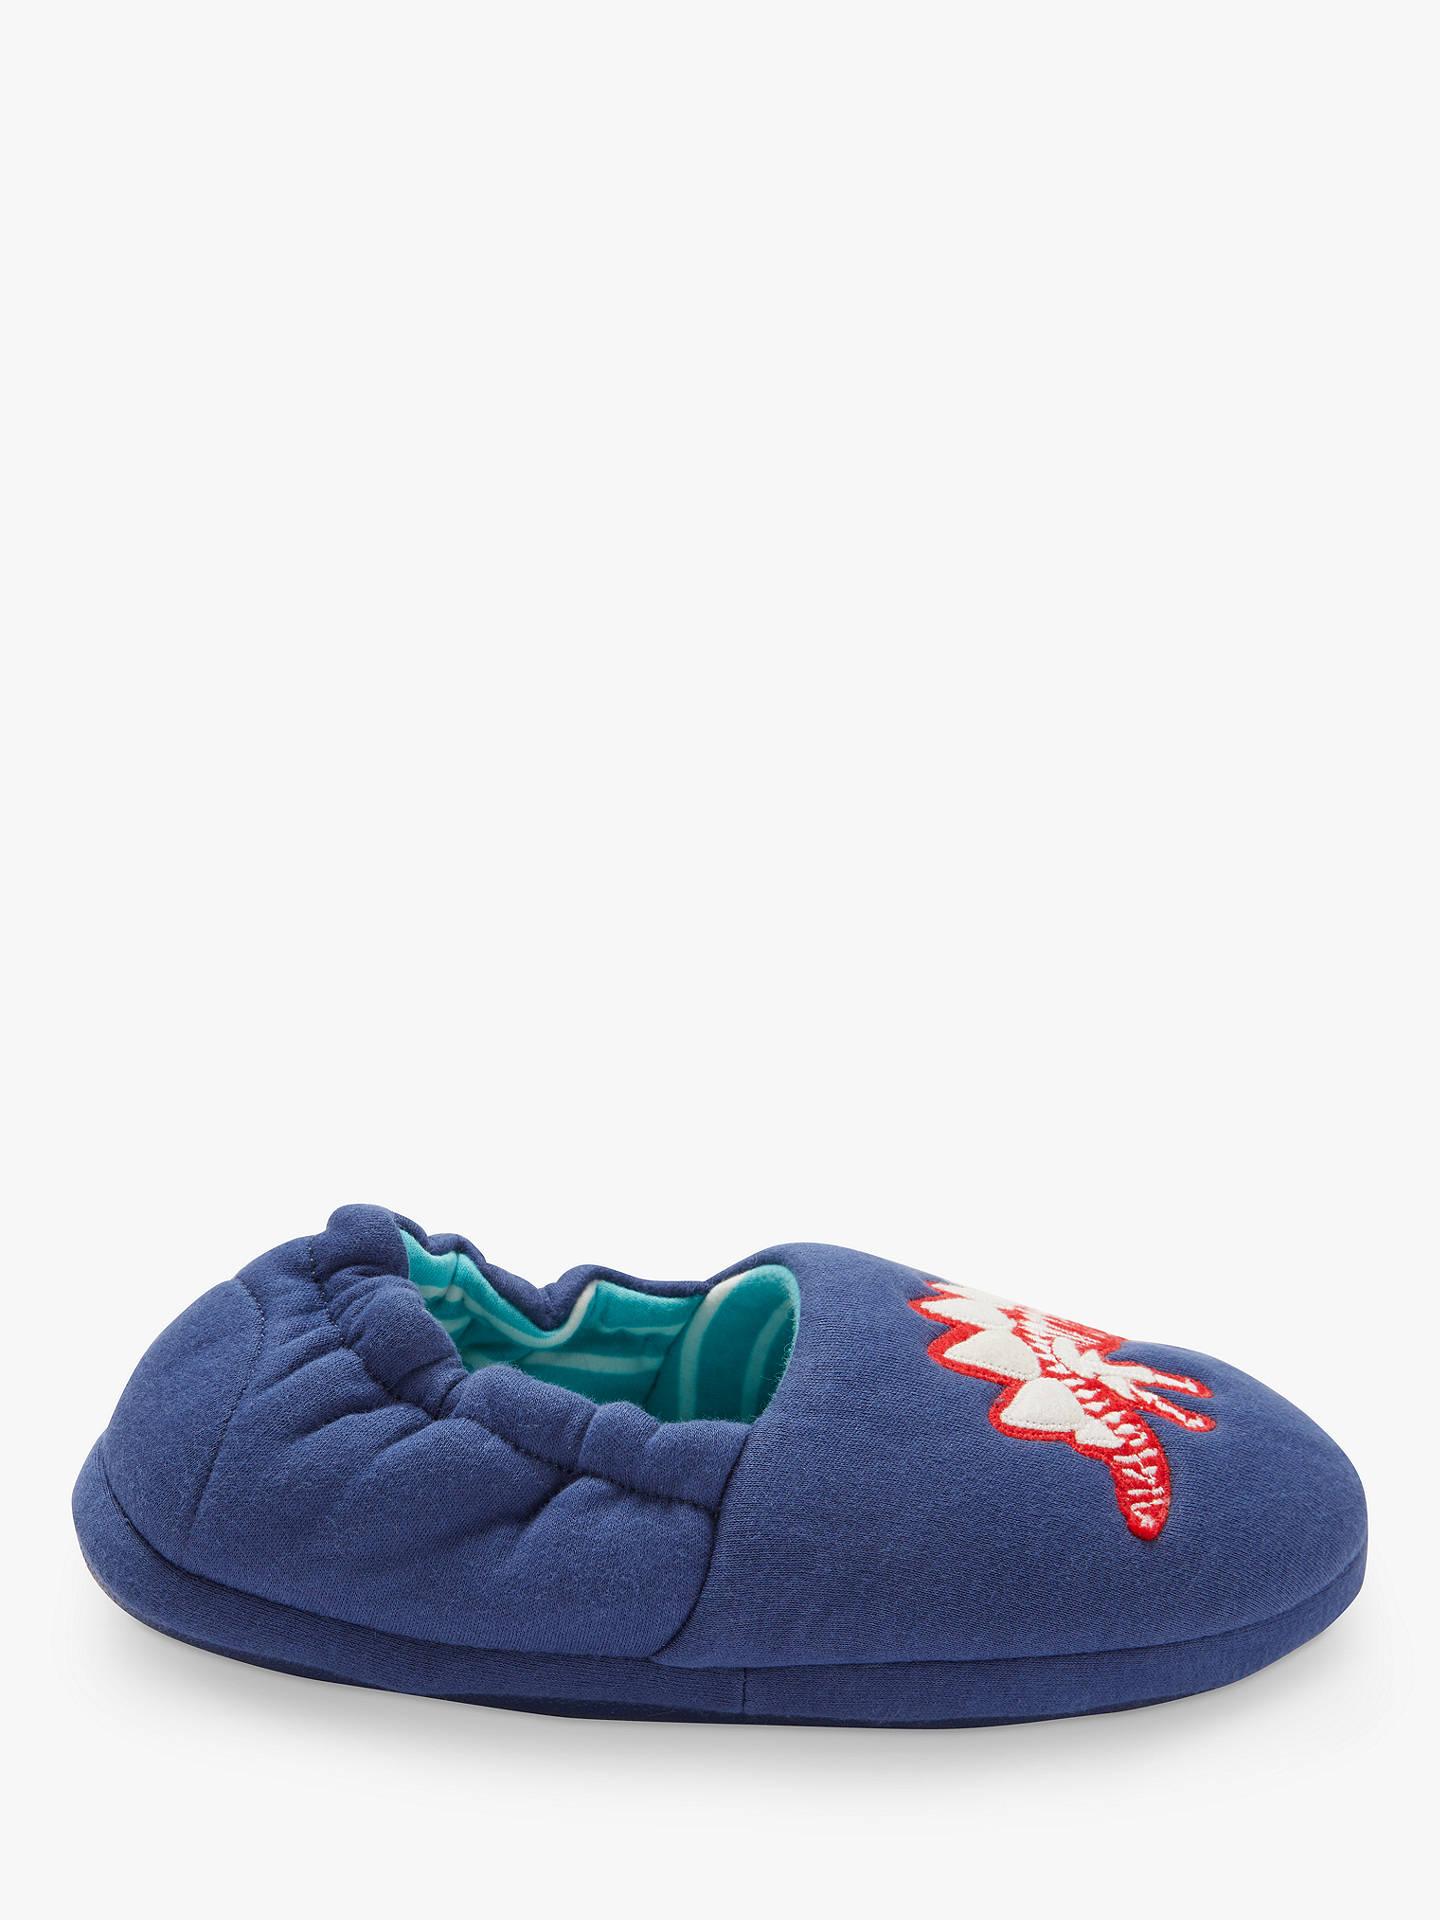 b8a6267d0c7 Buy John Lewis   Partners Children s Dino Slippers